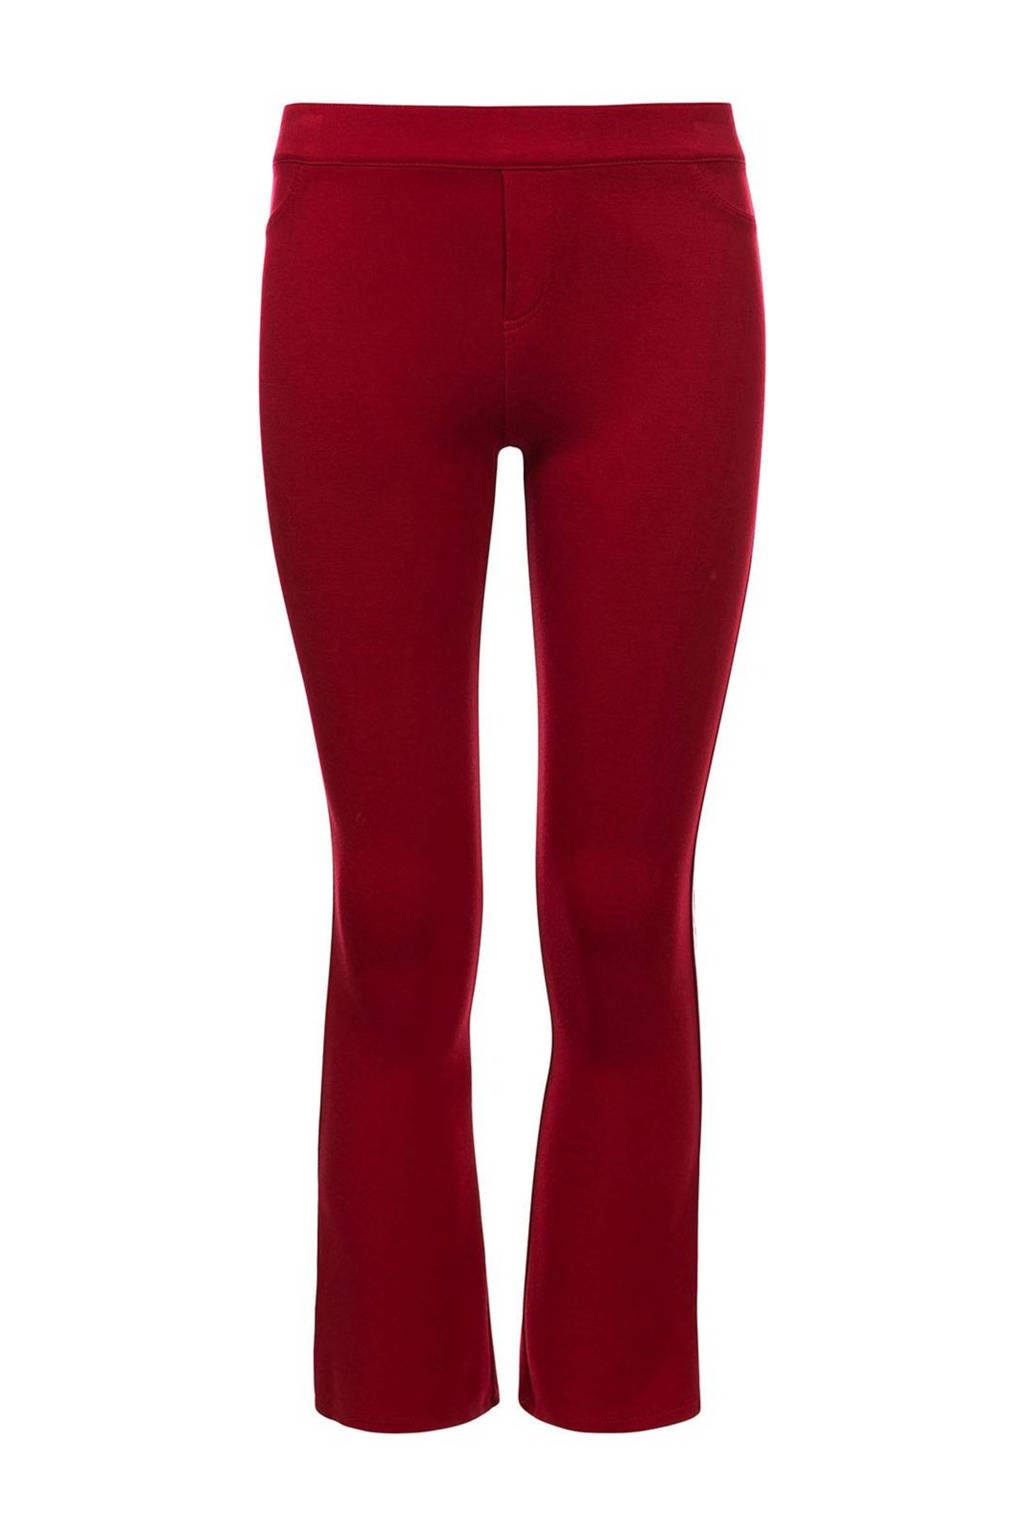 LOOXS 10sixteen flared broek met zijstreep rood, Rood